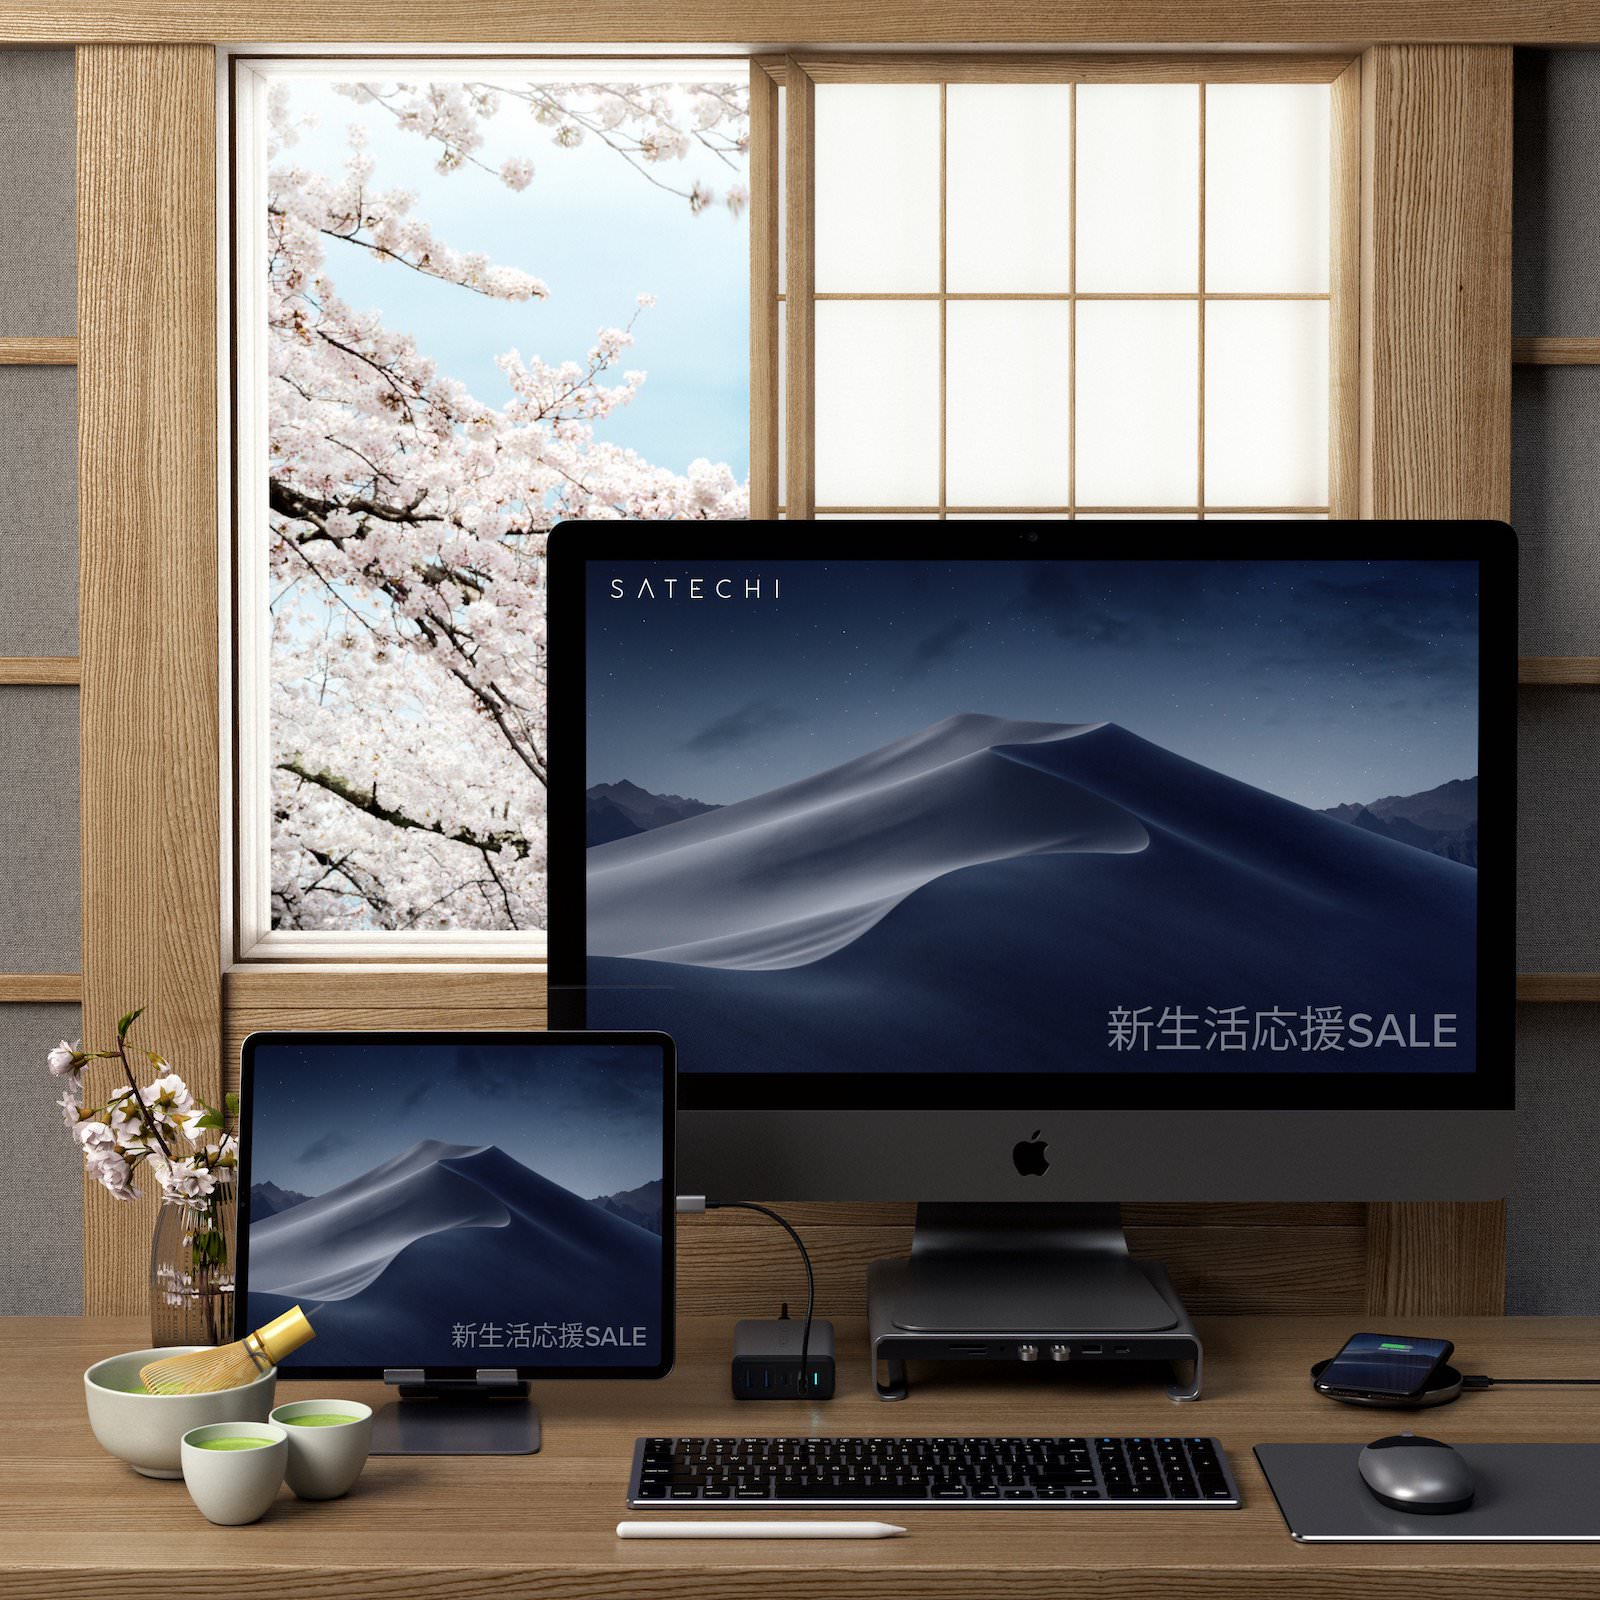 Satechi-New-Years-Sale.jpeg